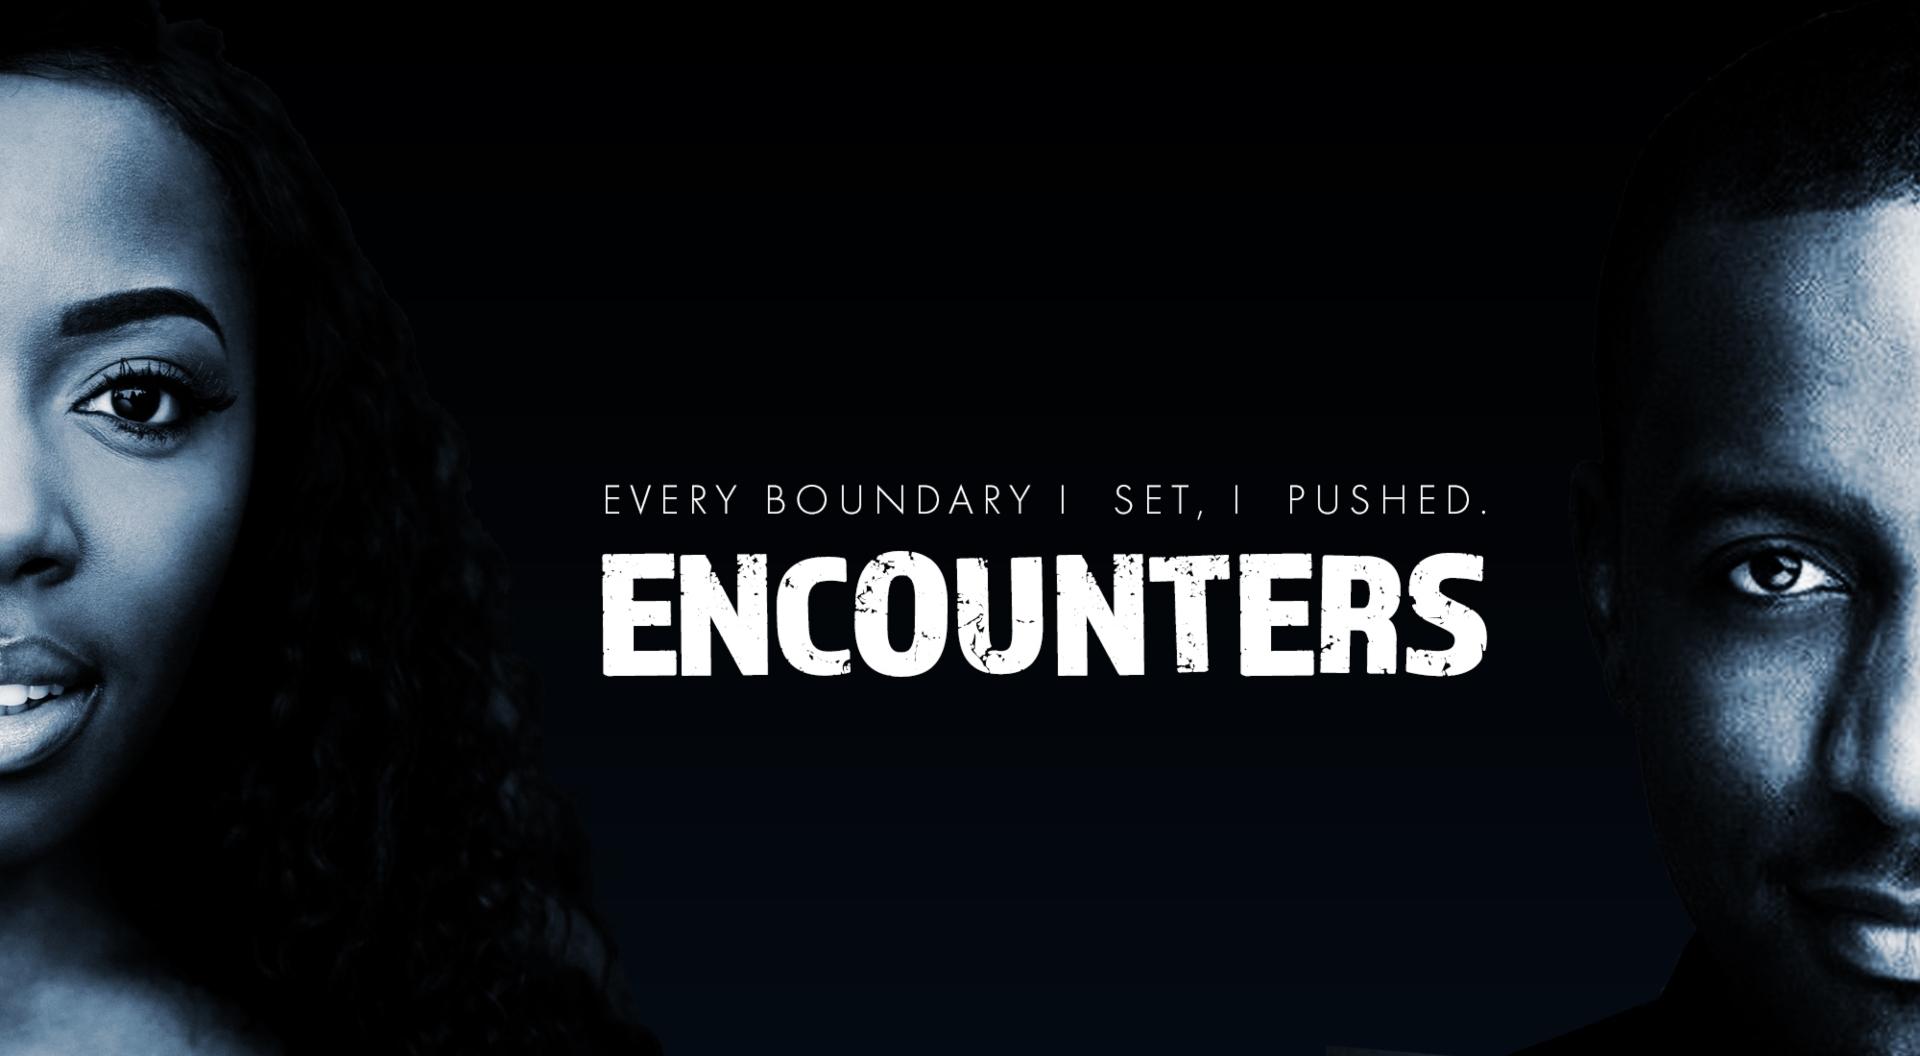 Encounters, Episode 1